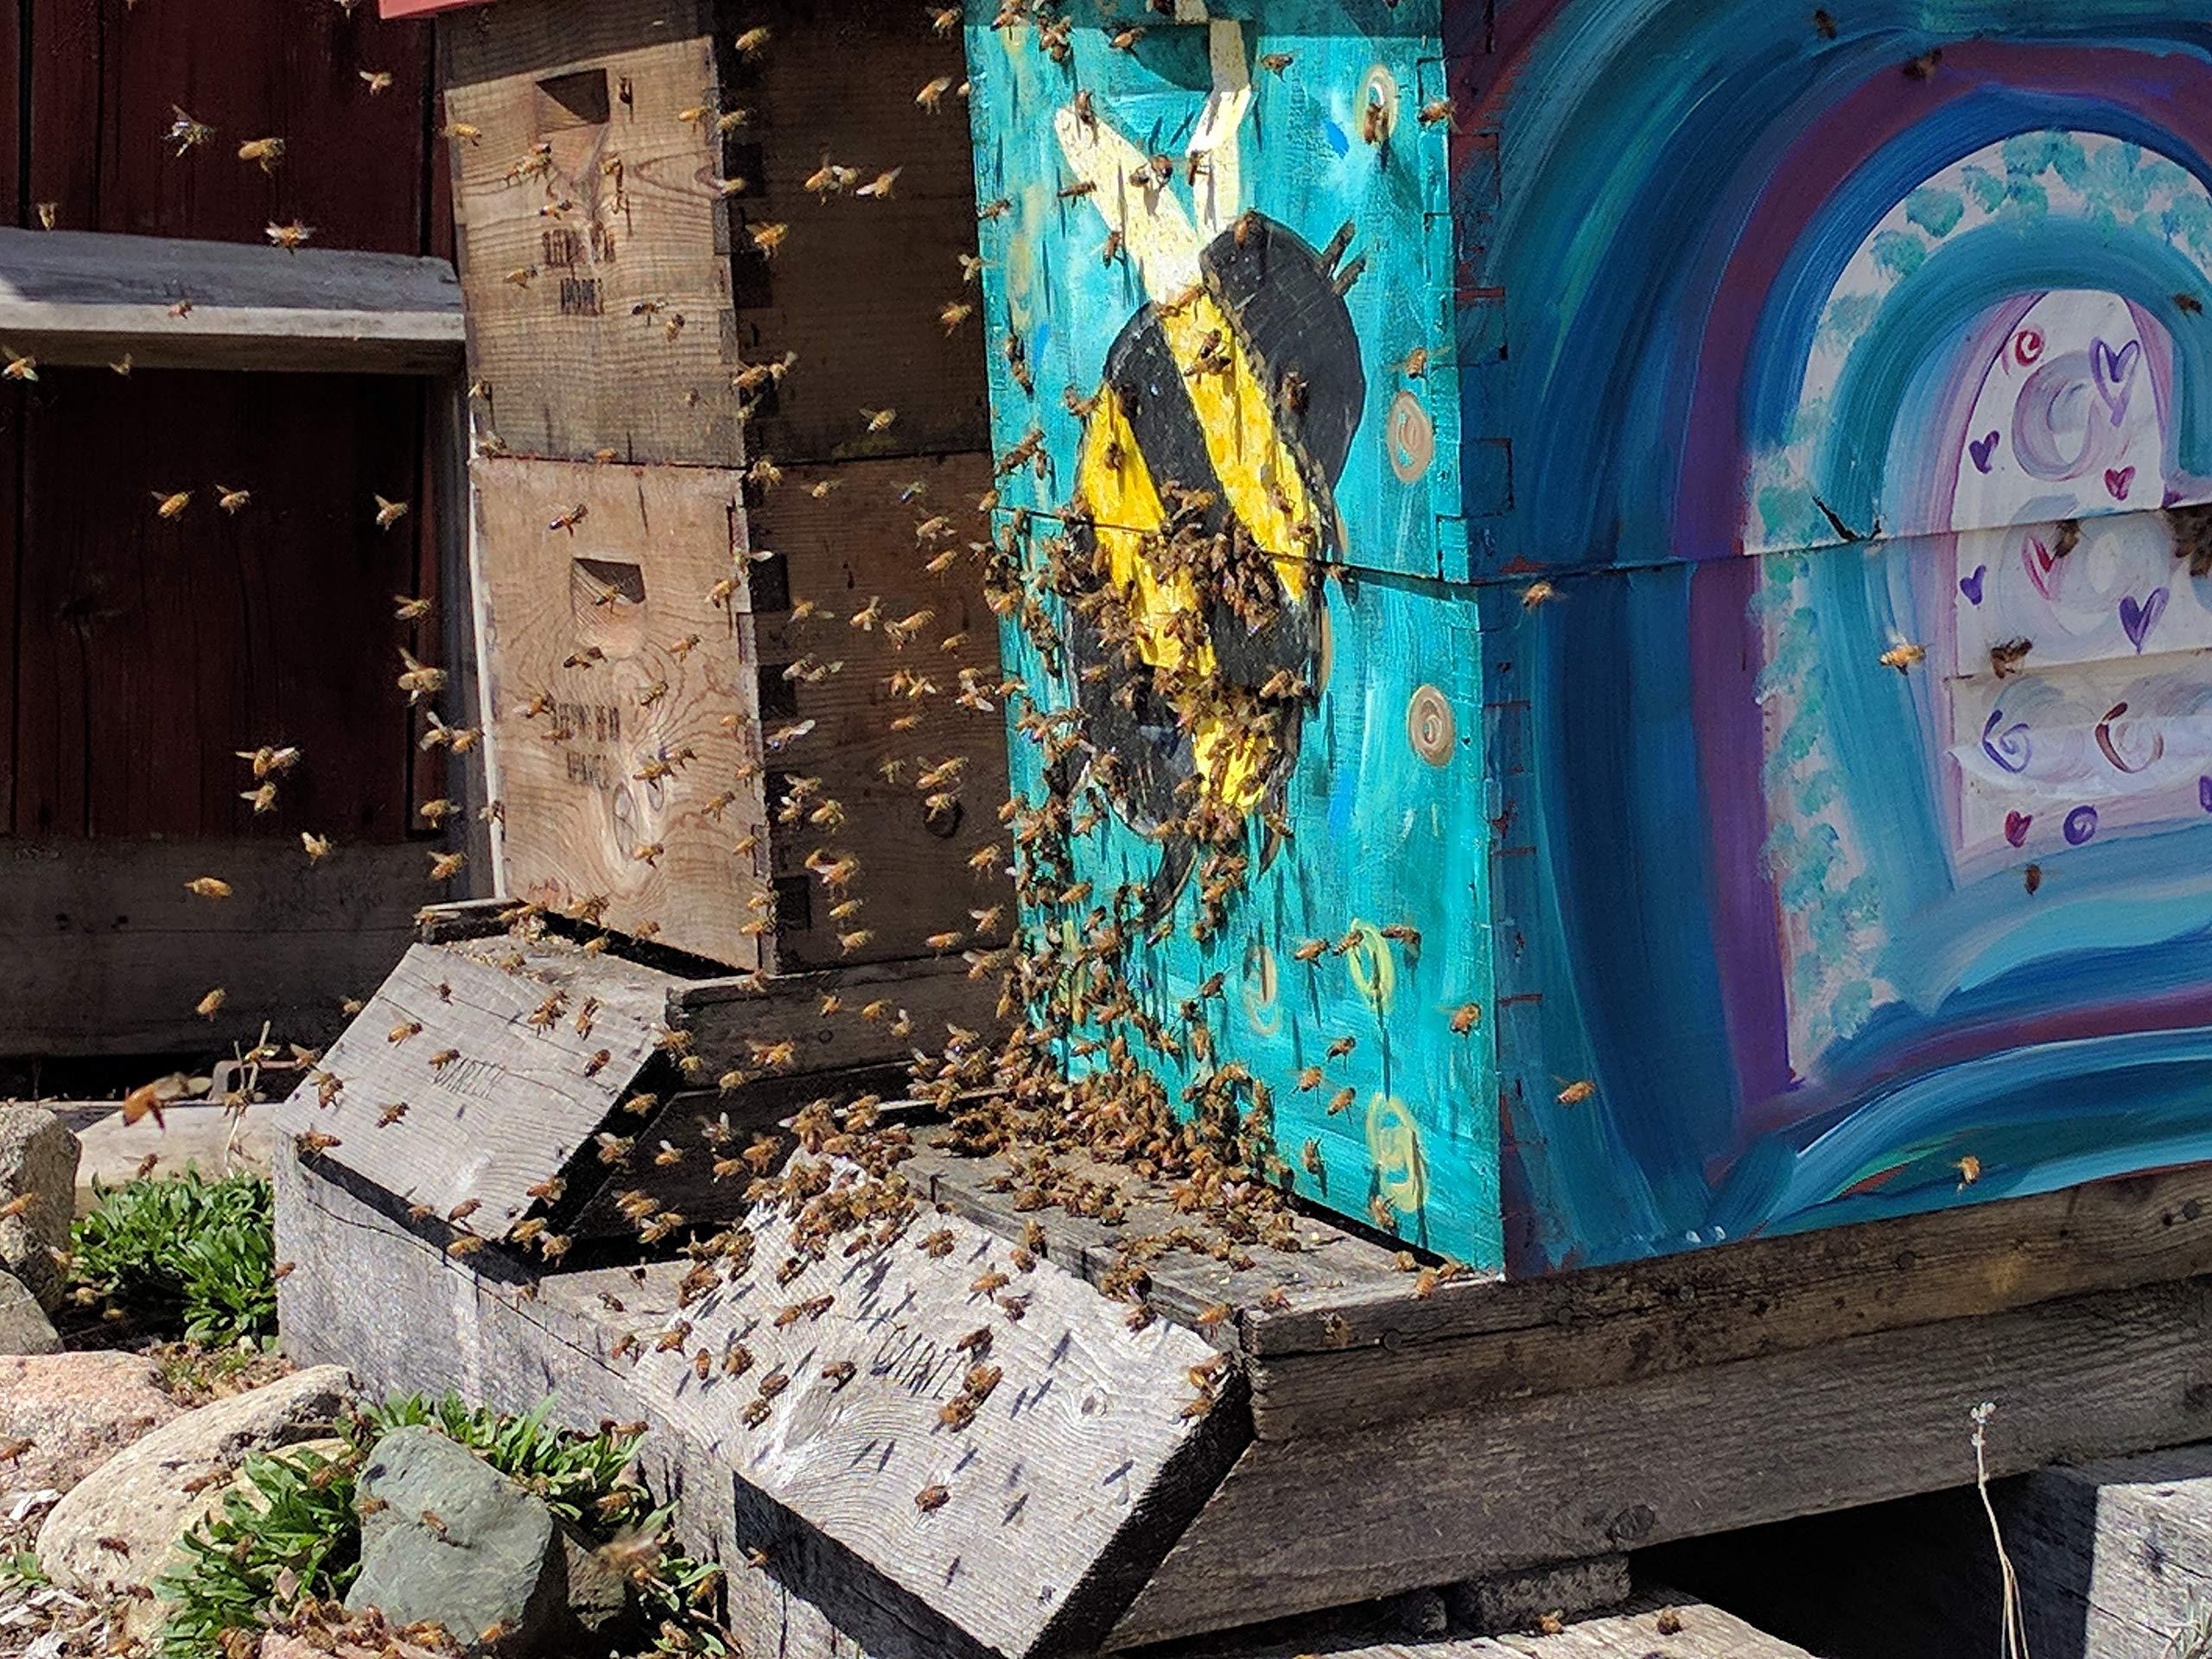 Tupelo Honey Bulk 5 Gallon Plastic Bucket - 60 lbs Premium Grade A Beekeepers Honey from Apalachicola River Basin